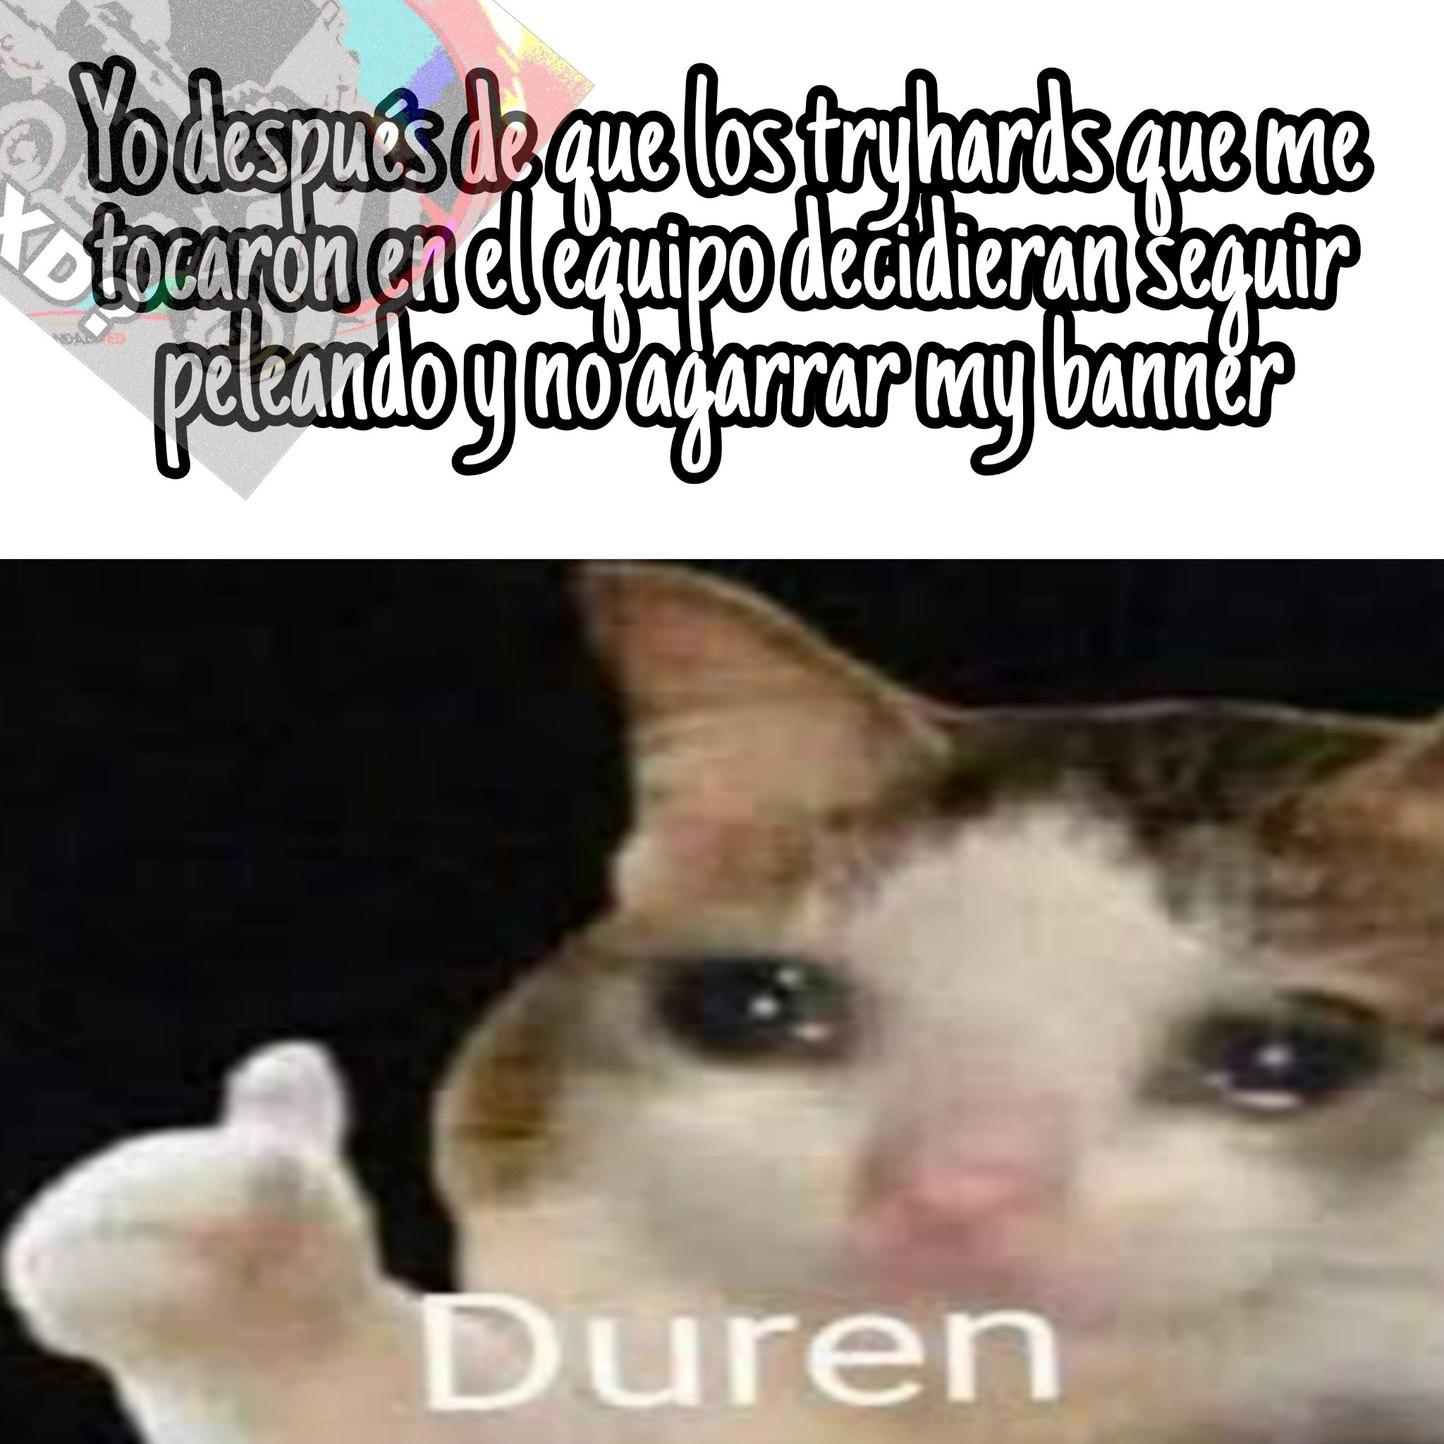 Malpario hijueputa agarre my banner - meme